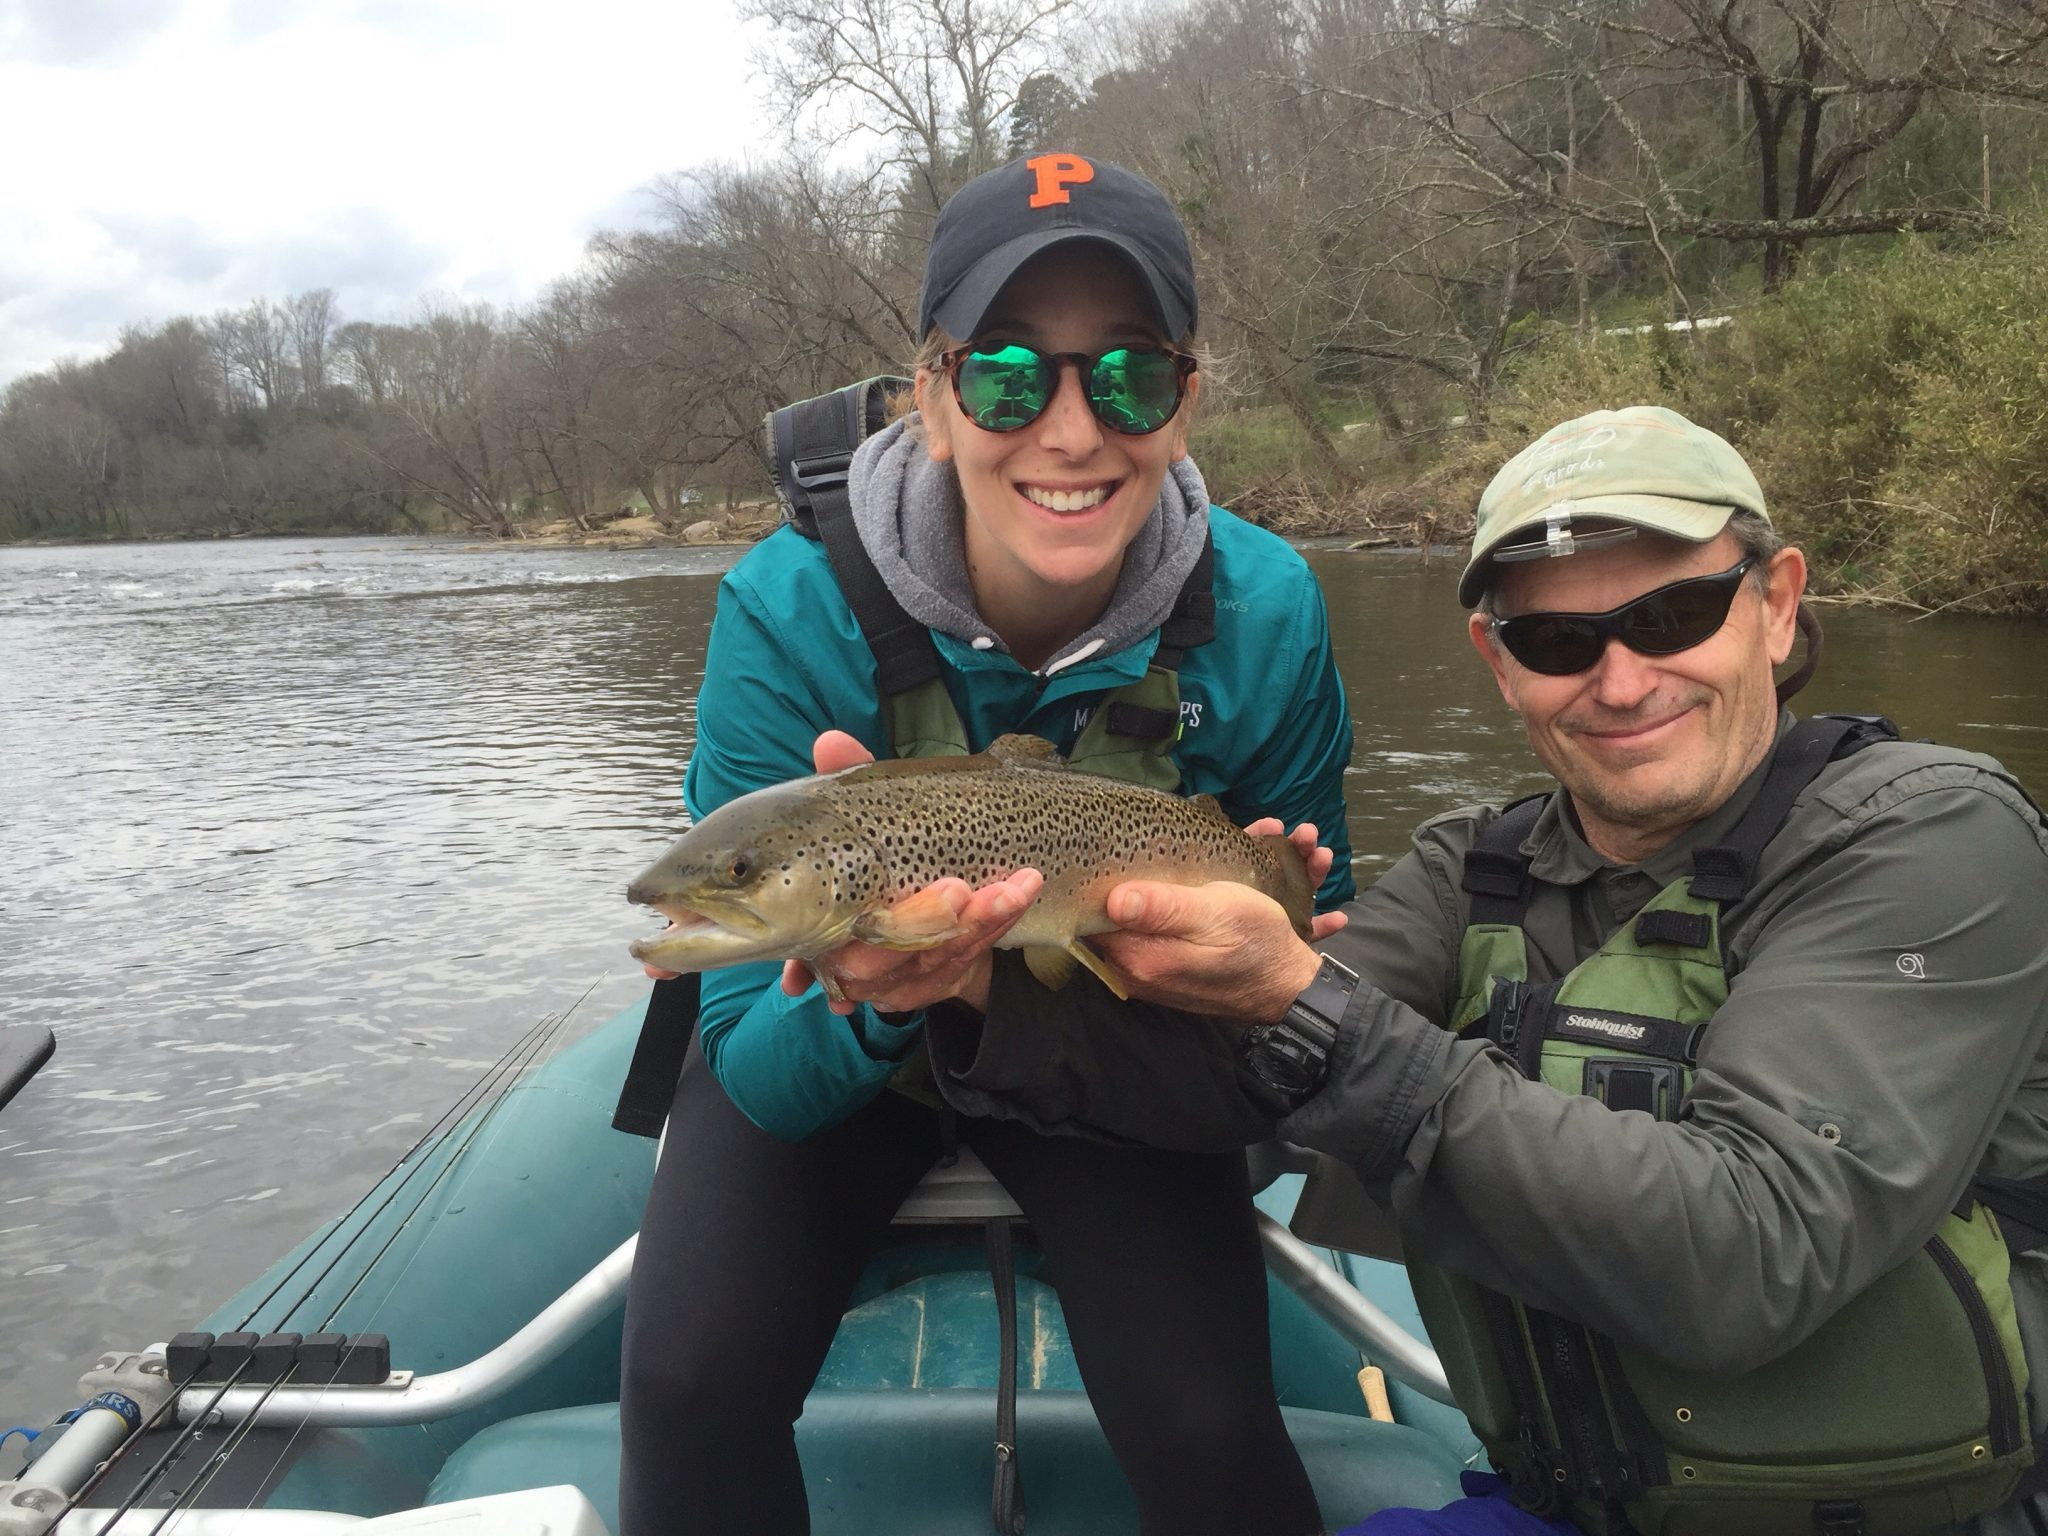 Fly fishing the Lower Tuckaseege